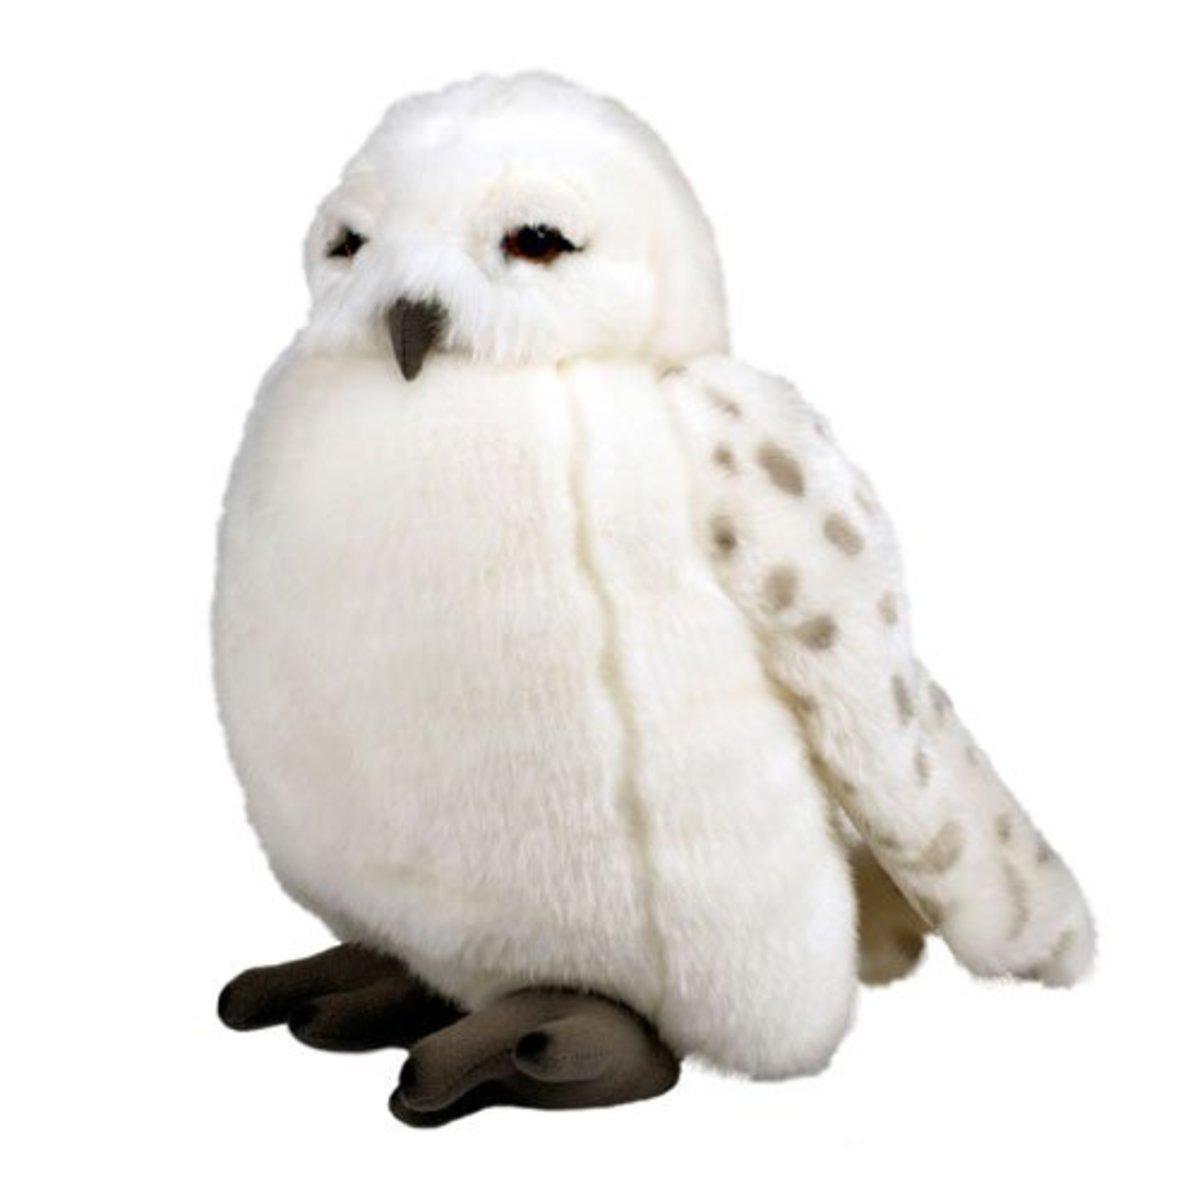 Hedwig Plush Toy